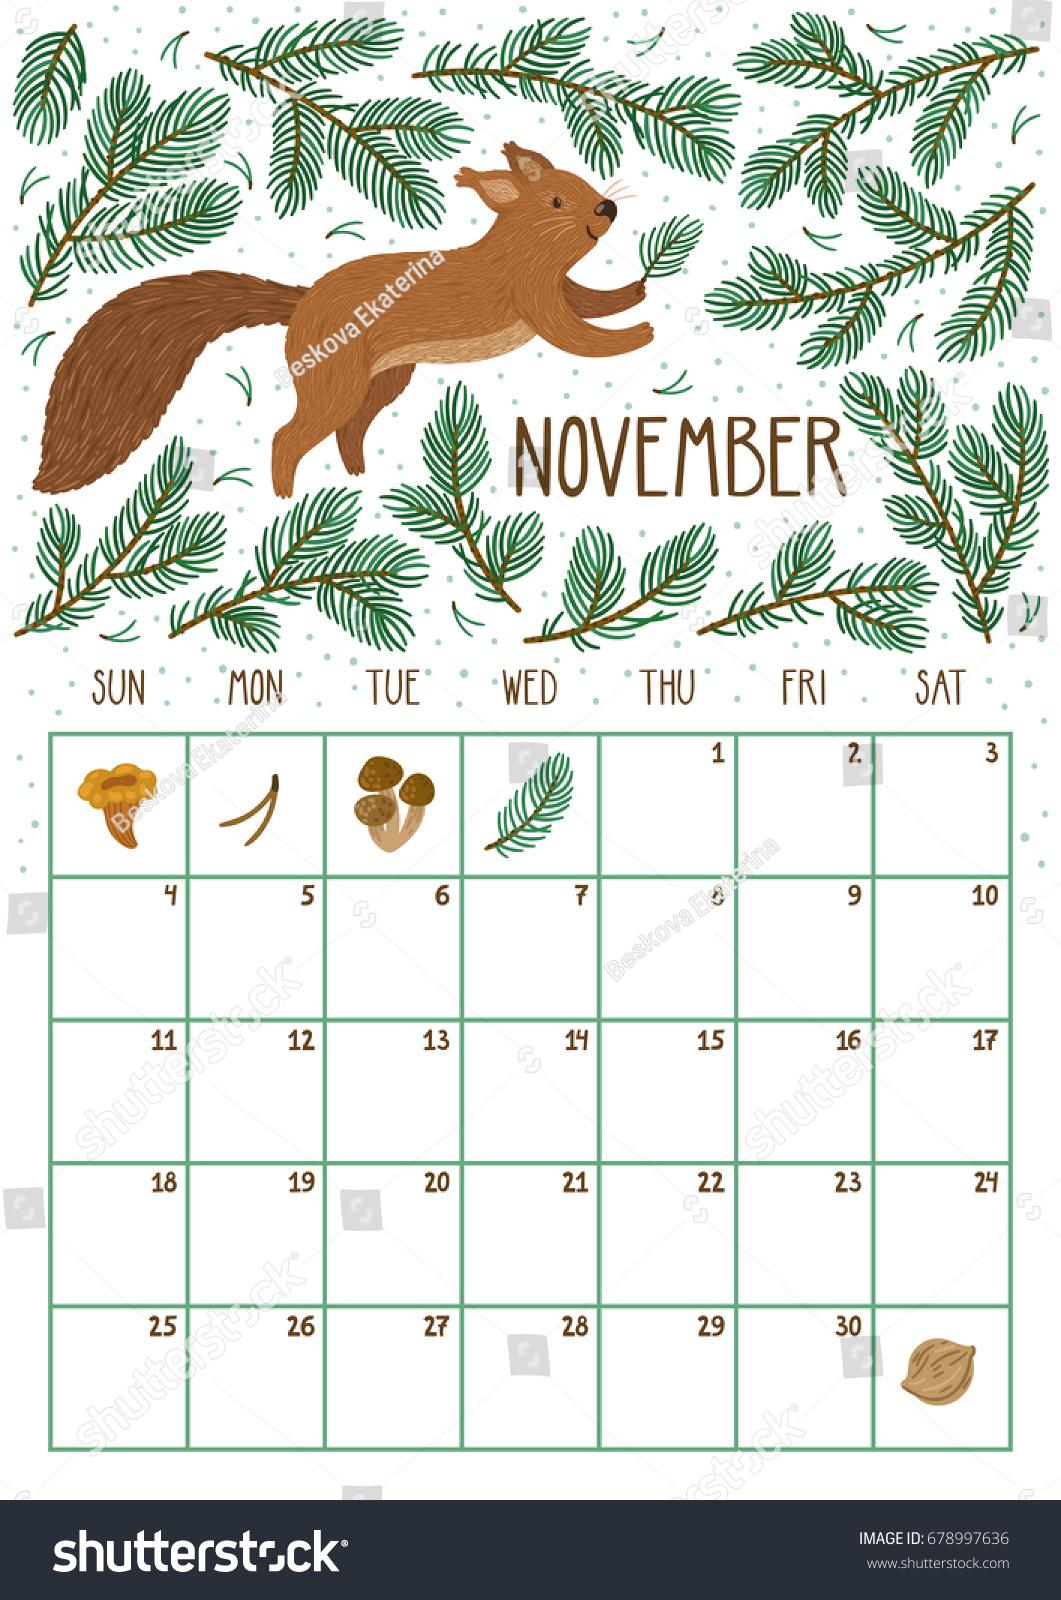 Vector Monthly Calendar Cute Squirrel November Stock Vektorgrafik